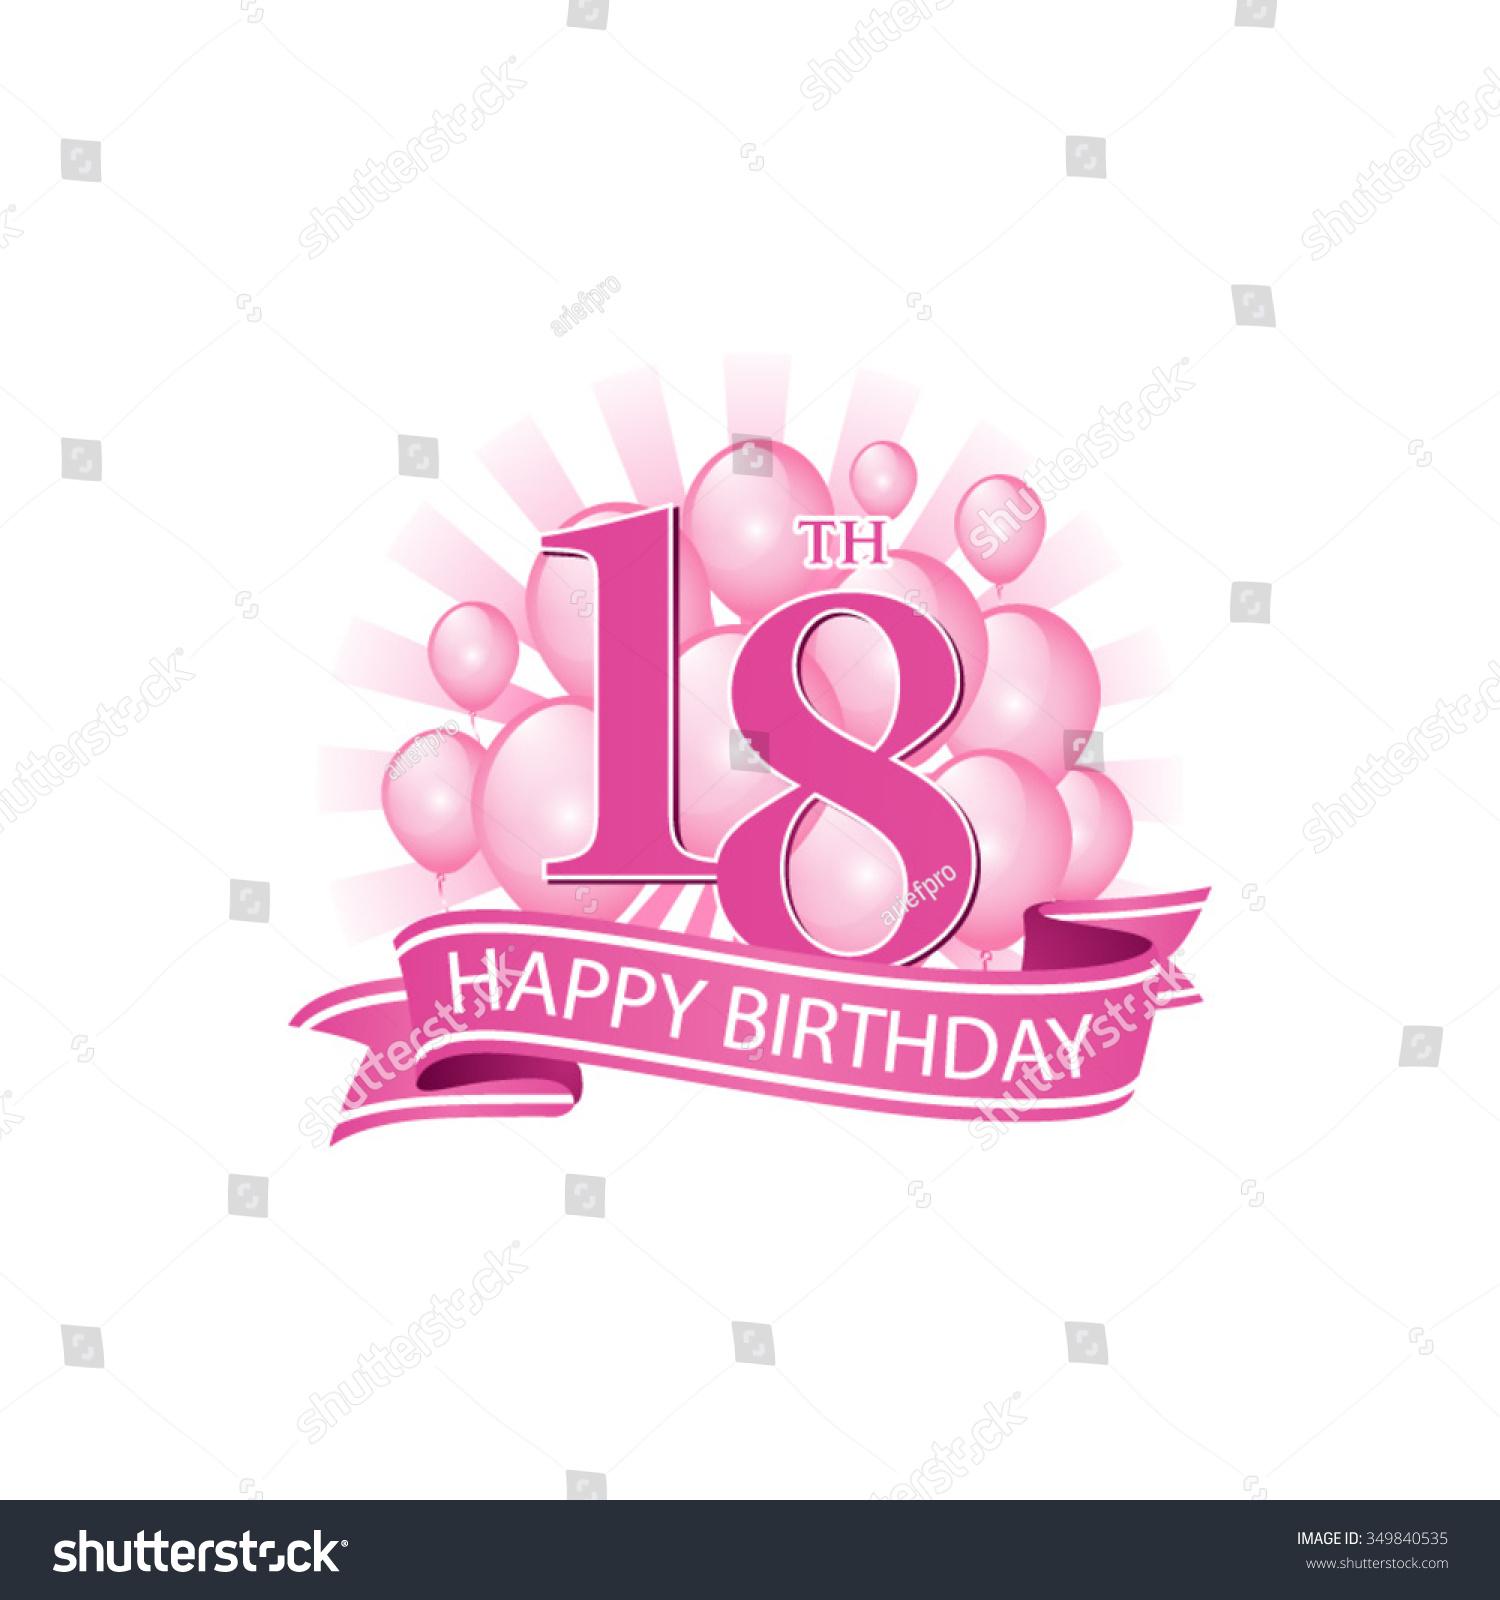 Pink Happy 18th Birthday Balloon: 18th Pink Happy Birthday Logo Balloons Stock Vector